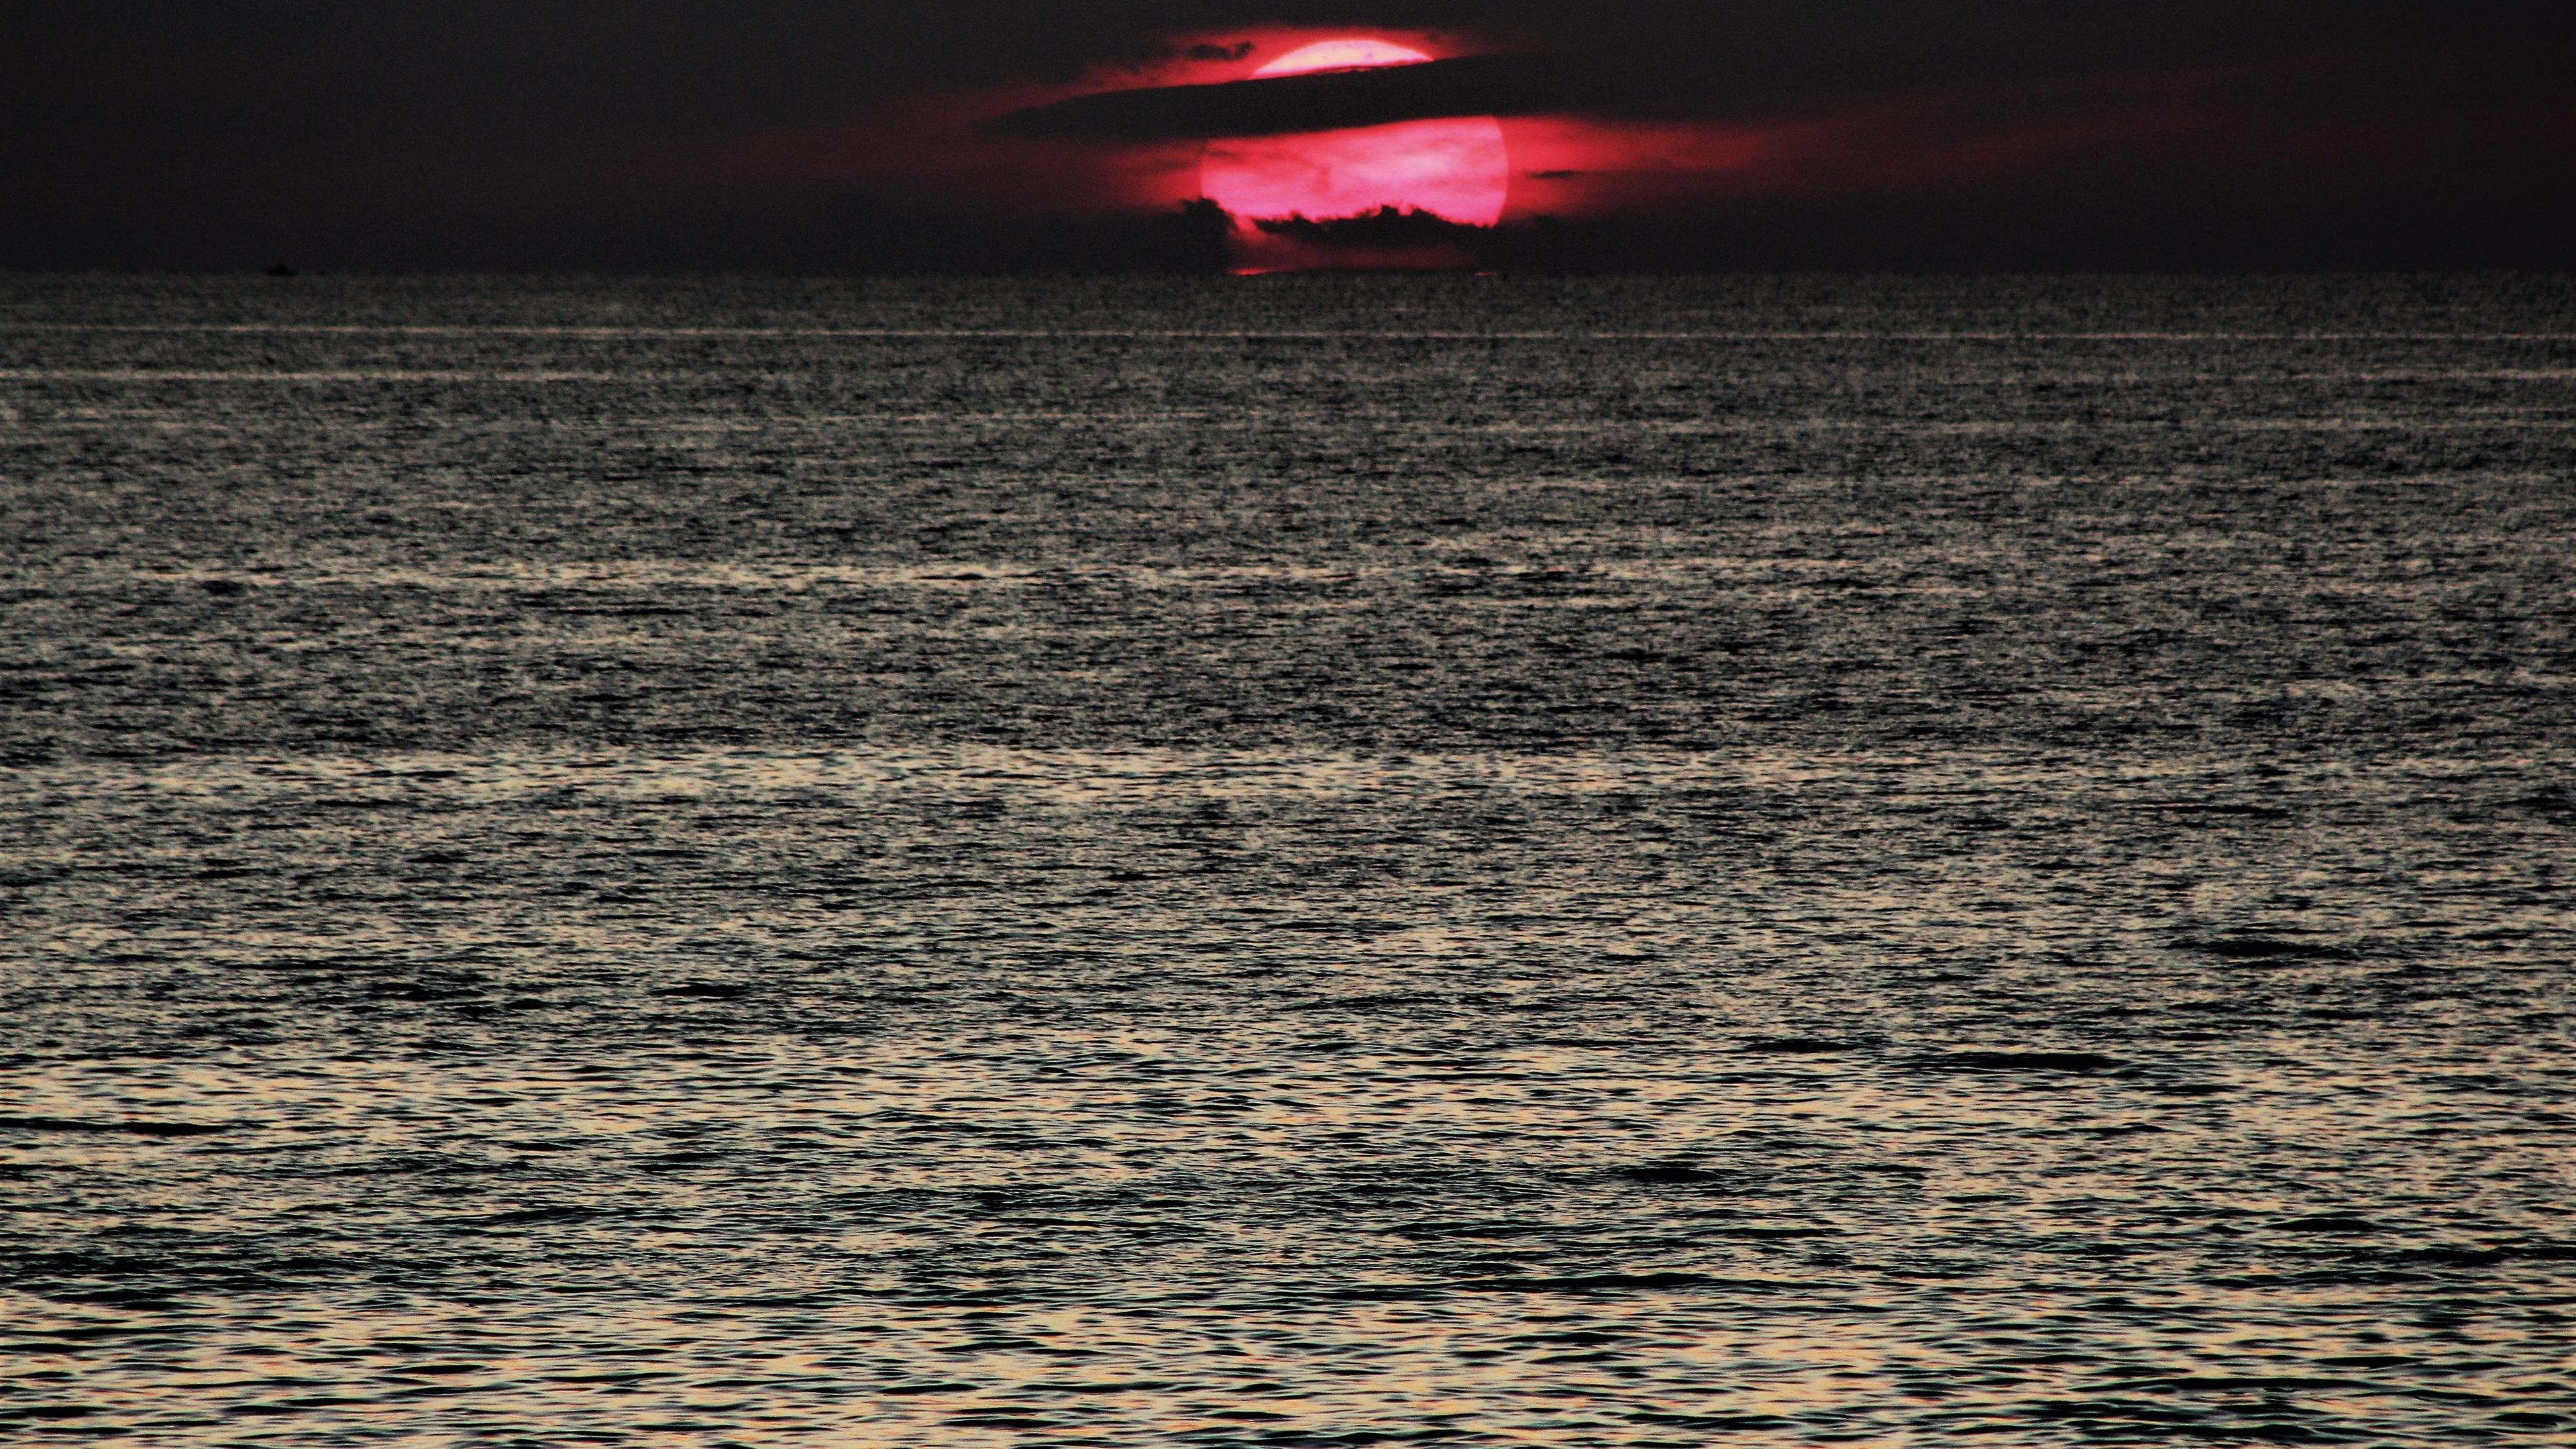 dark sunset red sea 4k 1540136313 - Dark Sunset Red Sea 4k - sunset wallpapers, sea wallpapers, red wallpapers, nature wallpapers, hd-wallpapers, dark wallpapers, 5k wallpapers, 4k-wallpapers